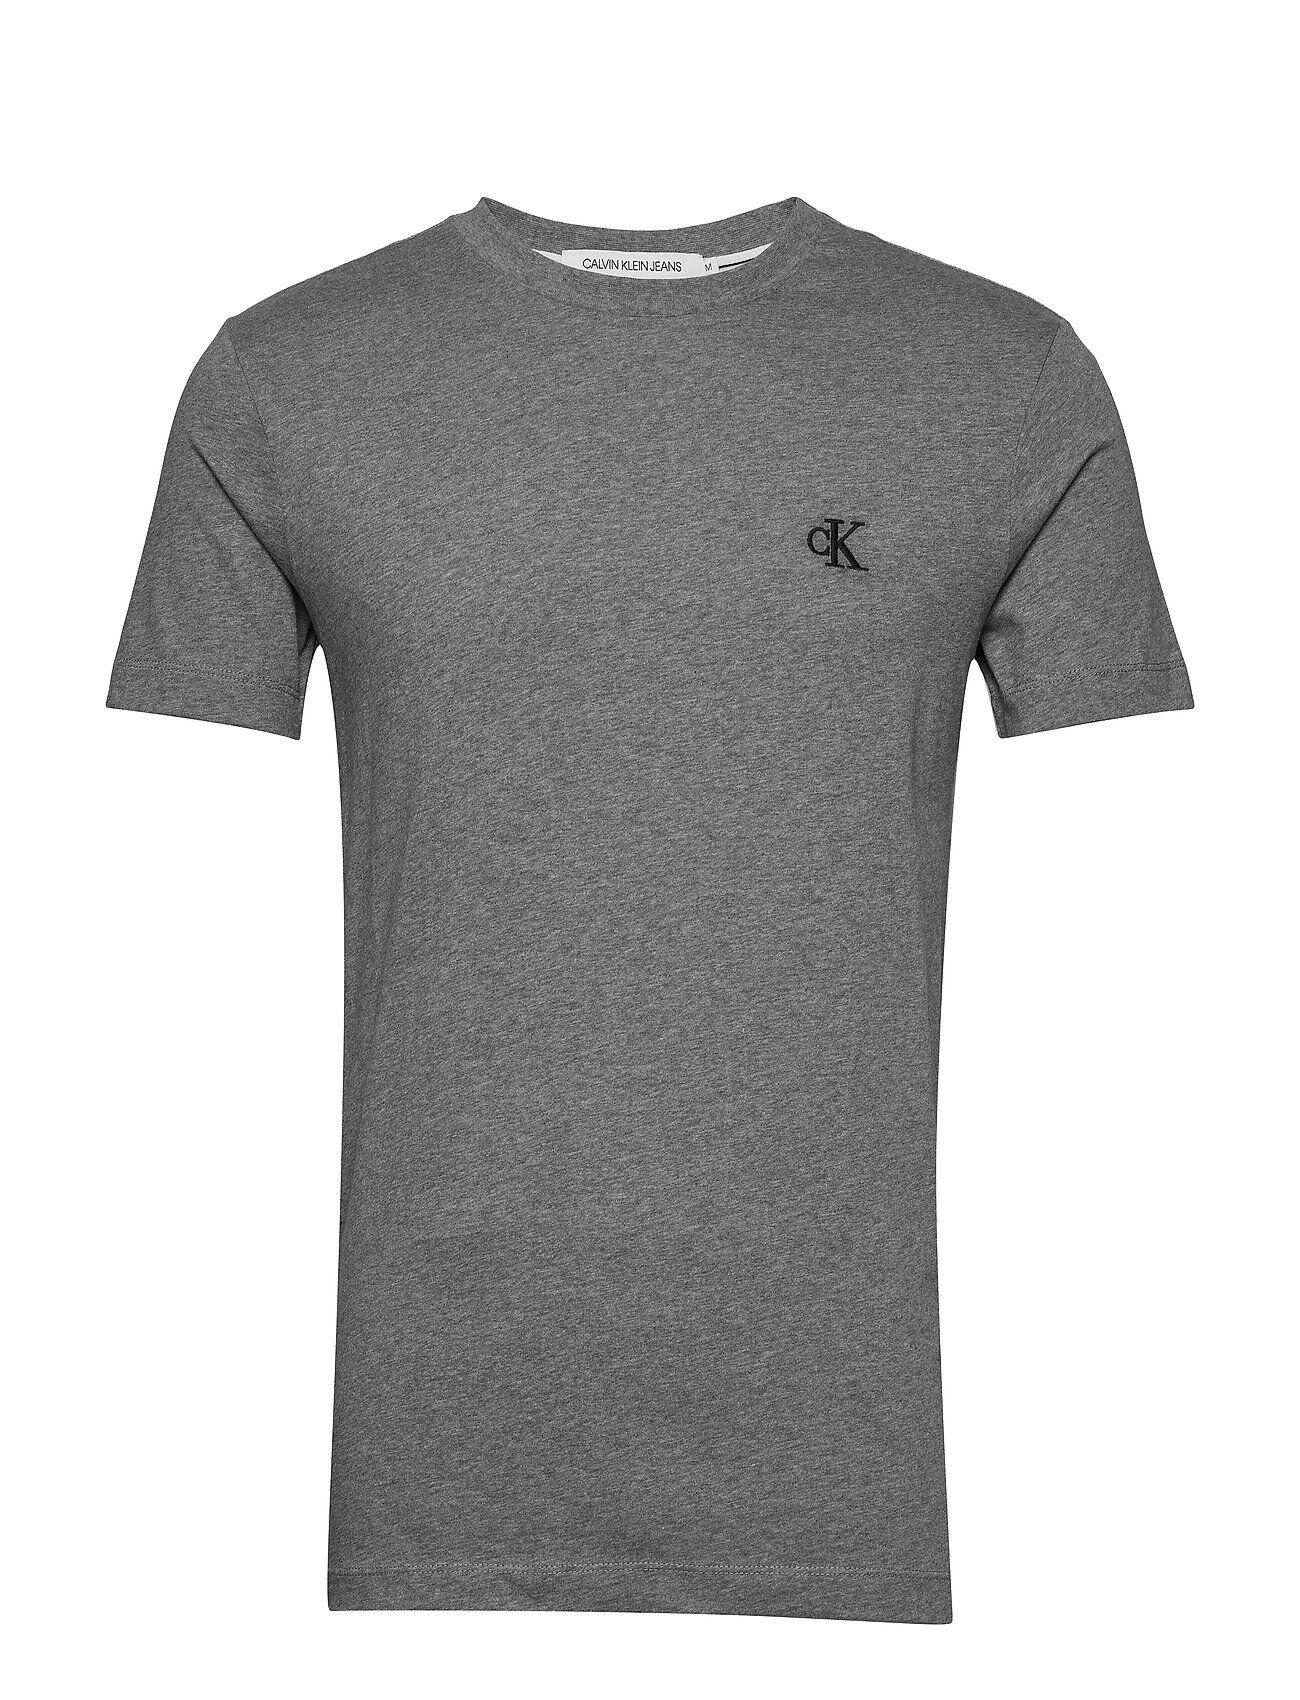 Image of Calvin Ck Essential Slim Tee T-shirts Short-sleeved Harmaa Calvin Klein Jeans